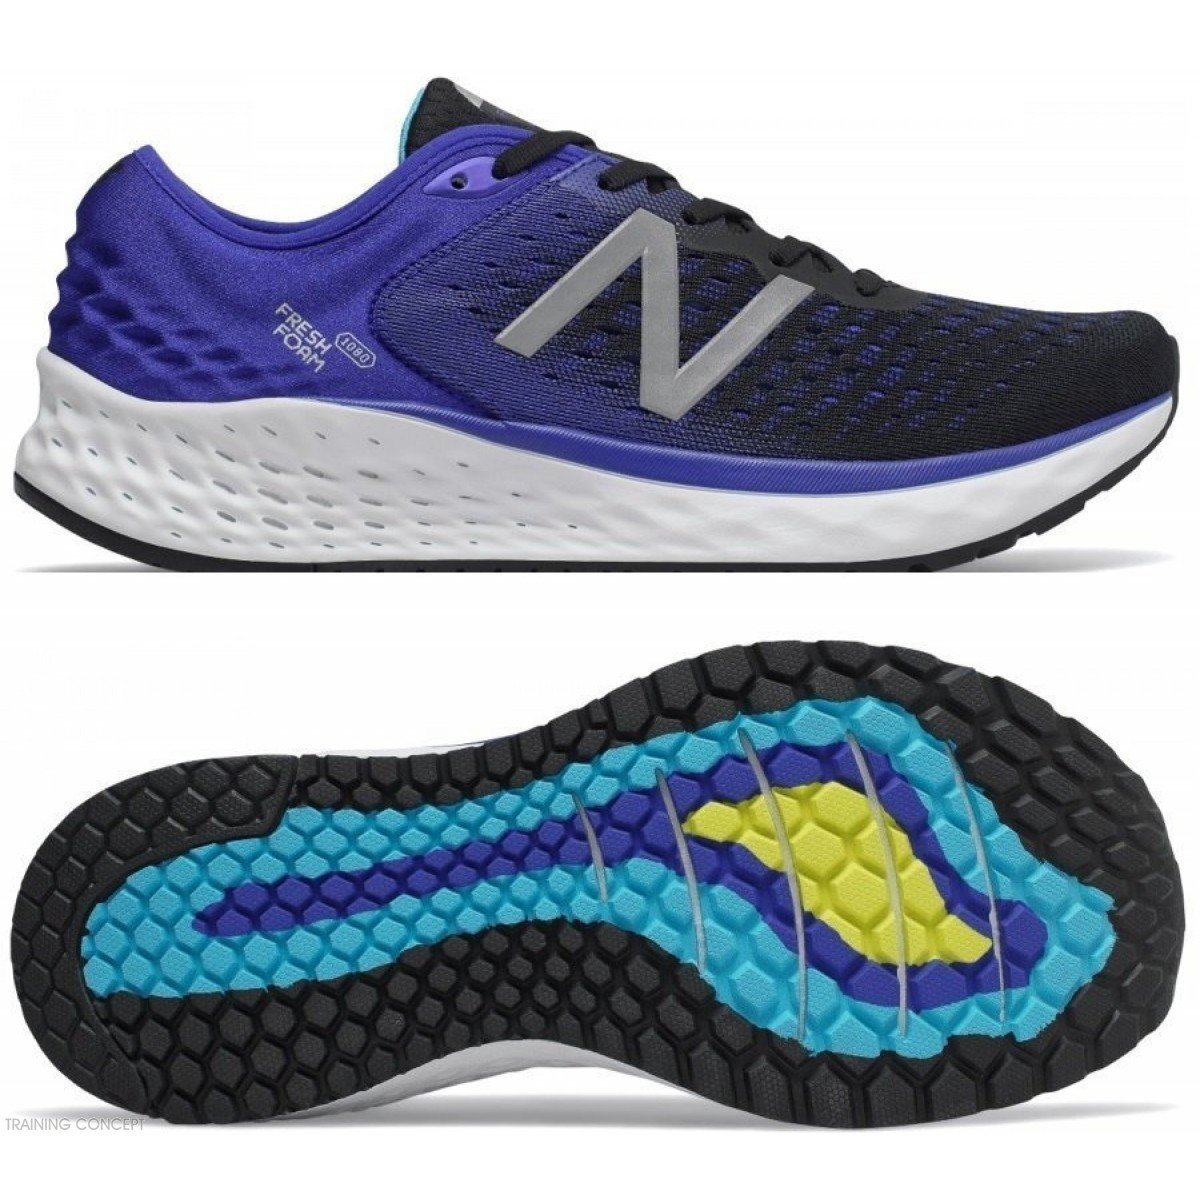 De V9 Hommes Uv9 Running Pour M1080 Chaussures New Balance 4AL5Rj